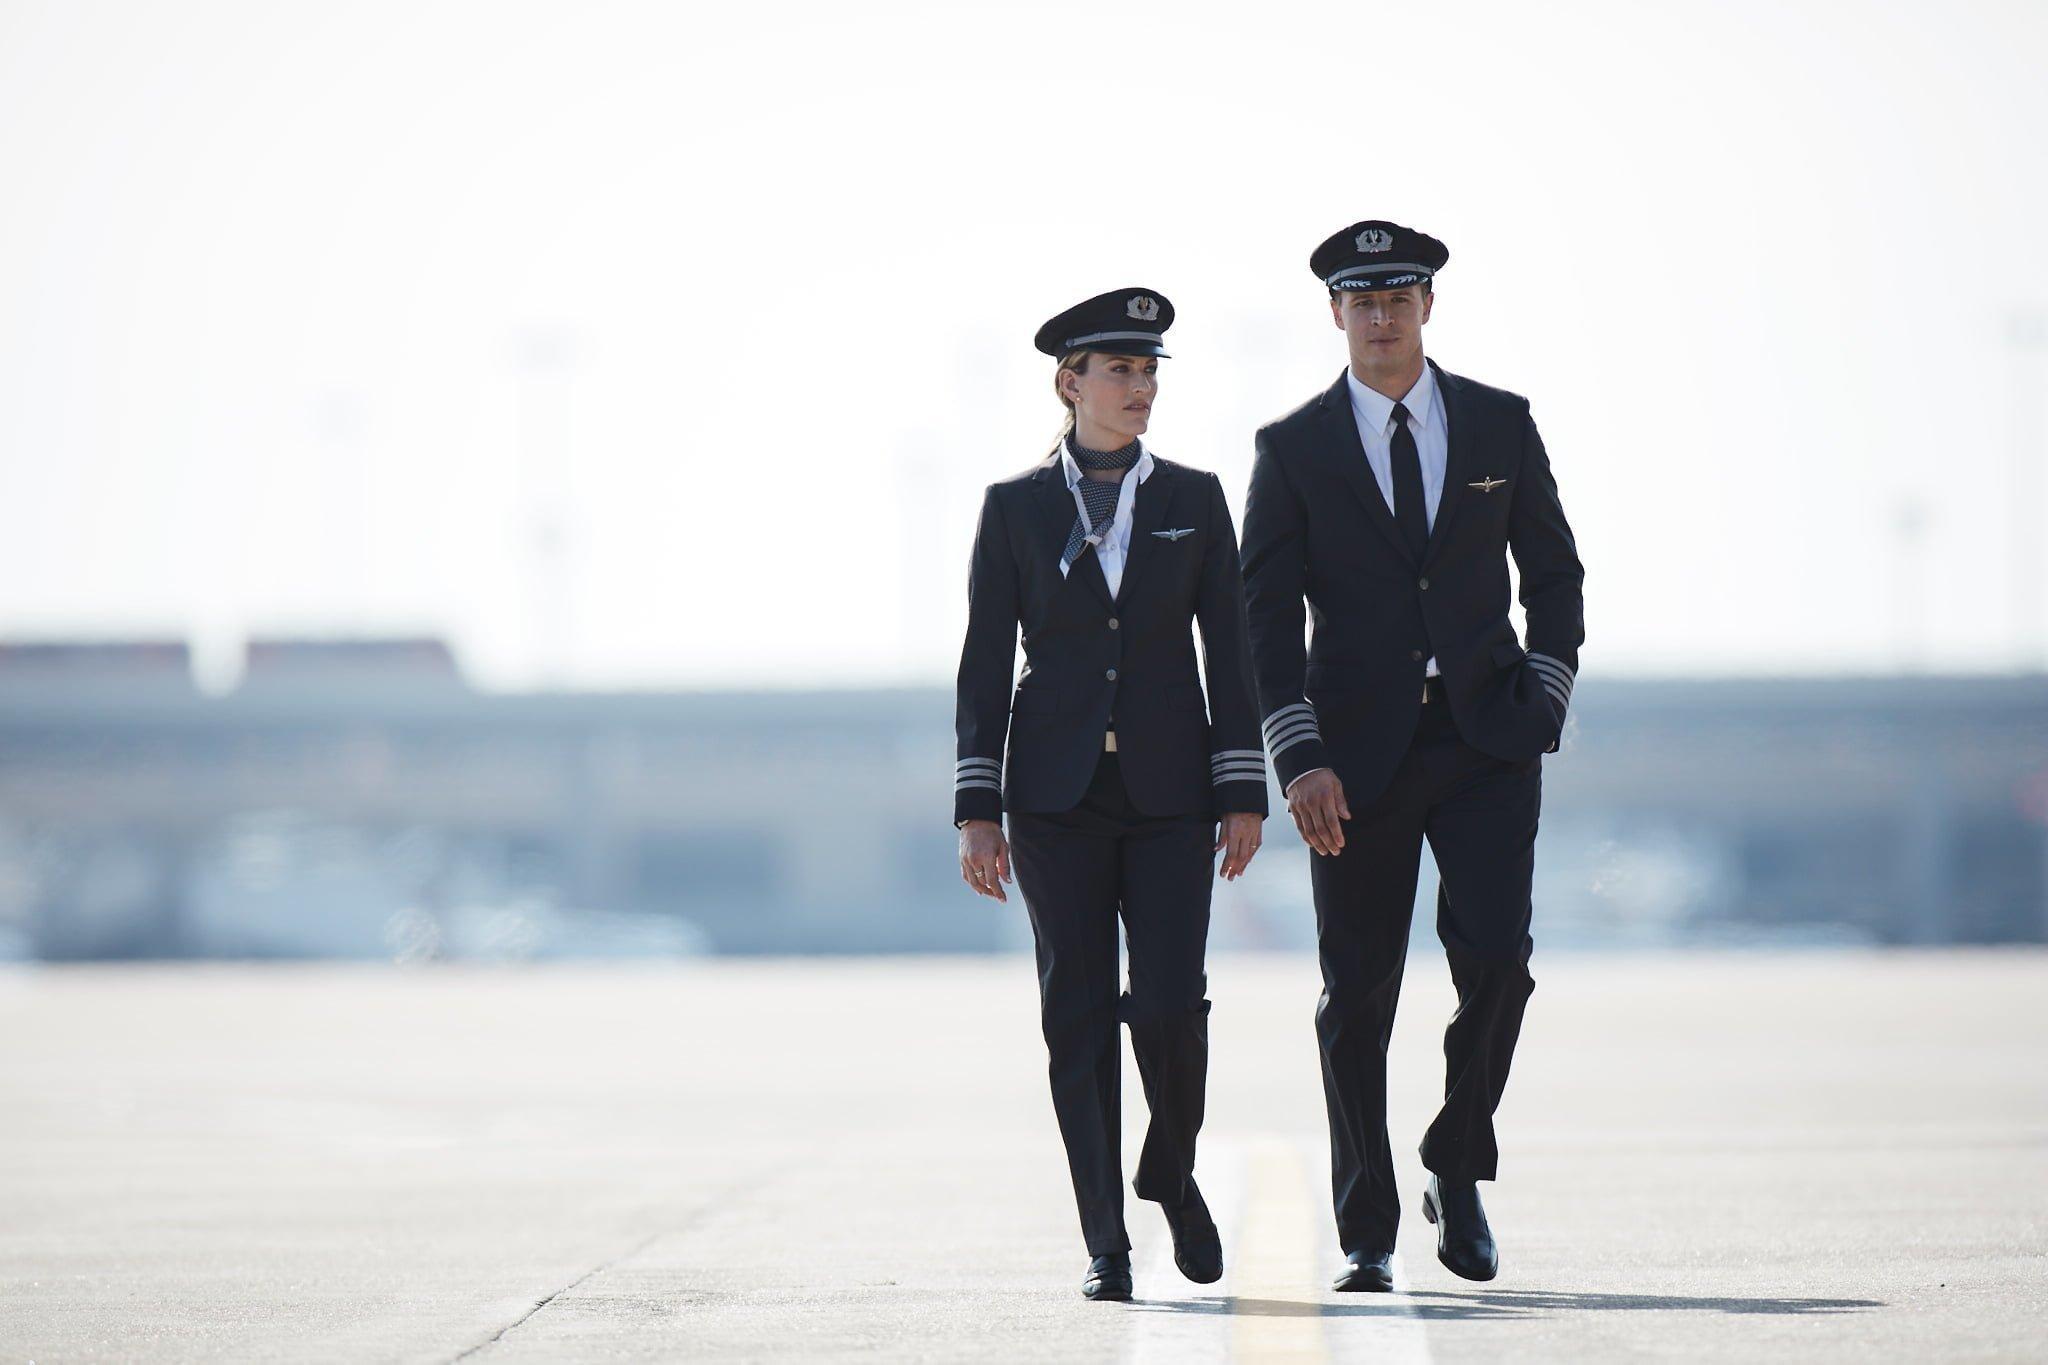 Uniforme de Pilotos de American Airlines